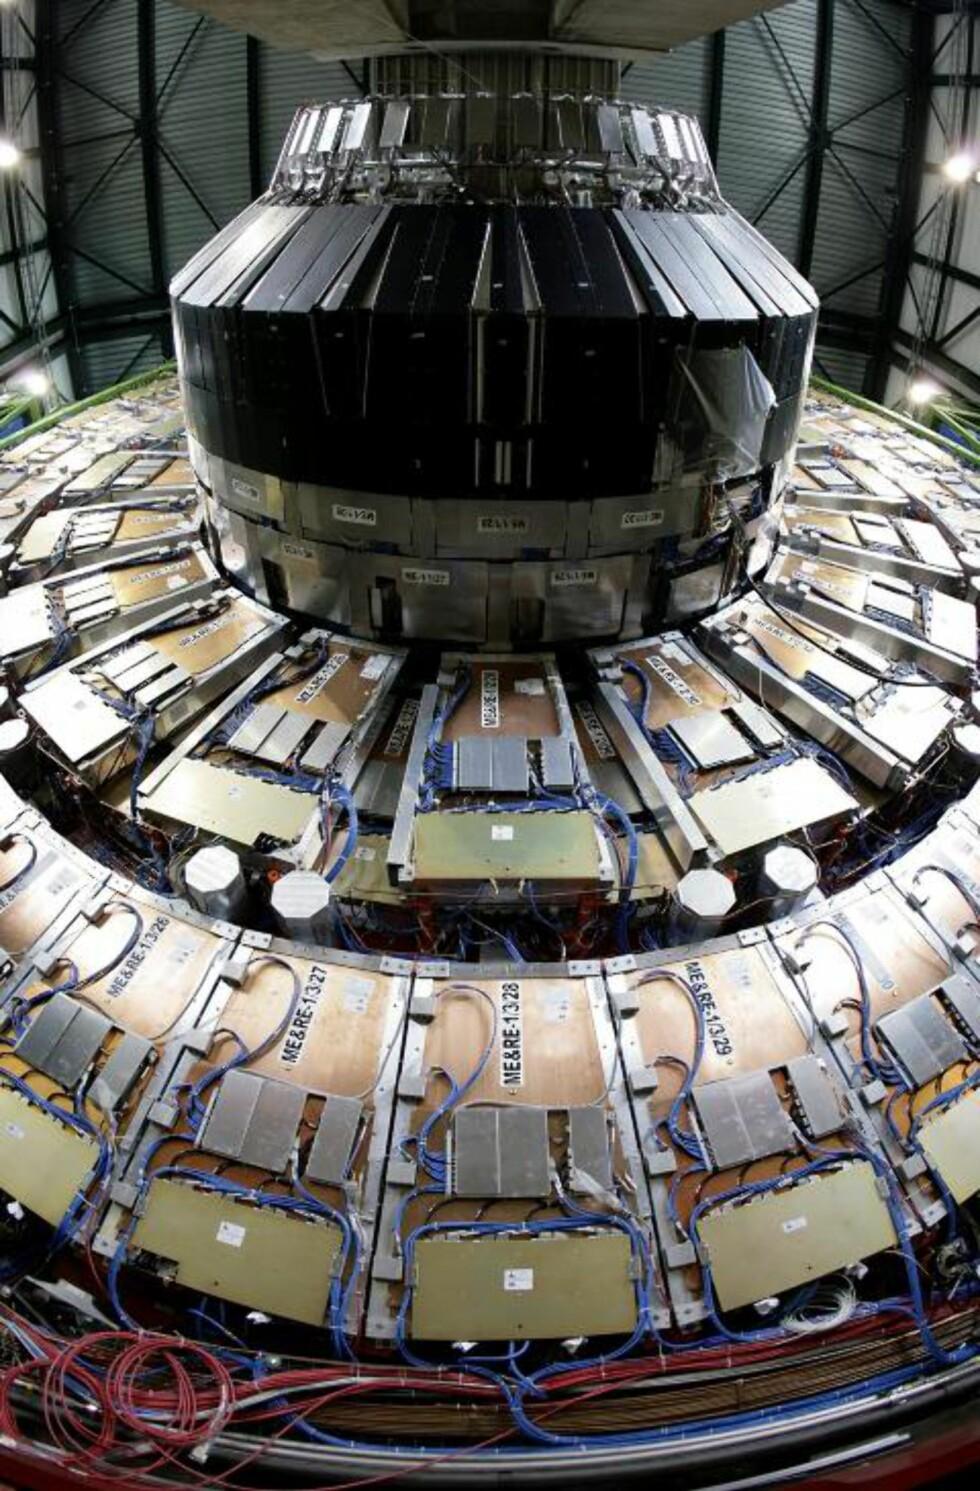 ENORM: Large Hadron Collider (LHC) ved CERN er verdens største partikkelakselerator, og går i en ring på den fransk-sveitsiske grensen nær Genève. Foto: AP Photo/Keystone, Martial Trezzini/SCANPIX